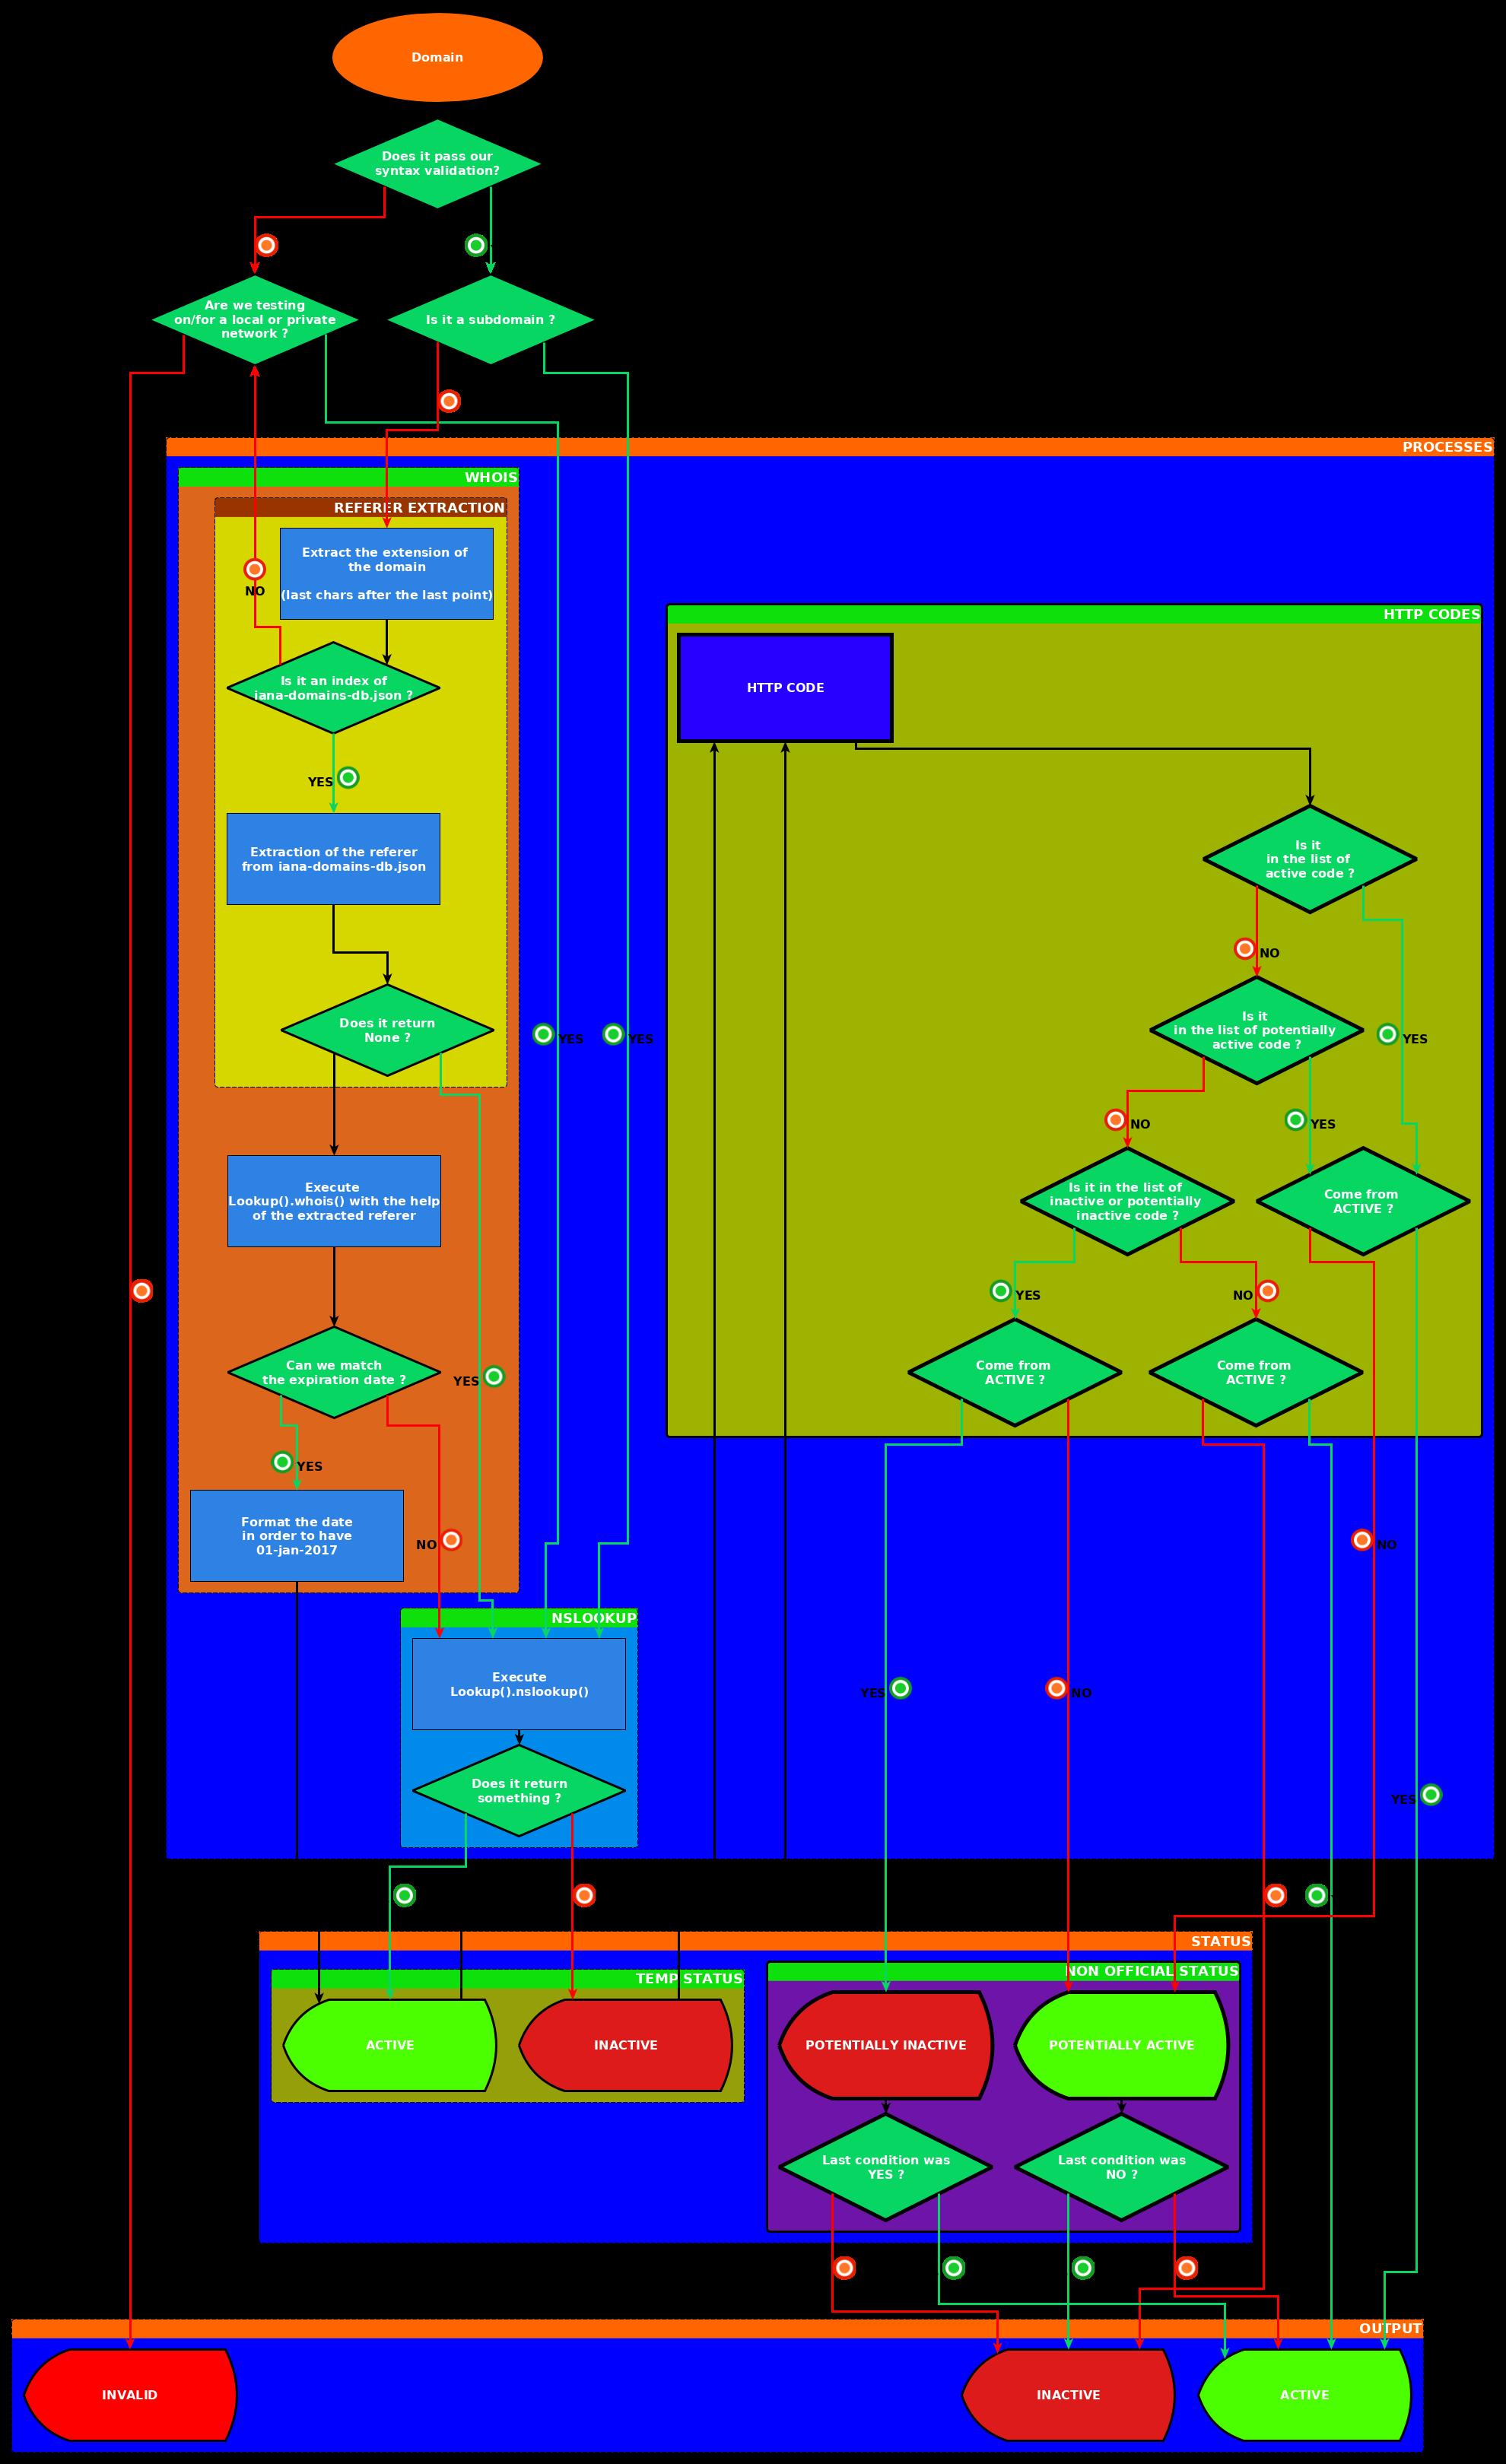 PyFunceble Logic representation for domain testing